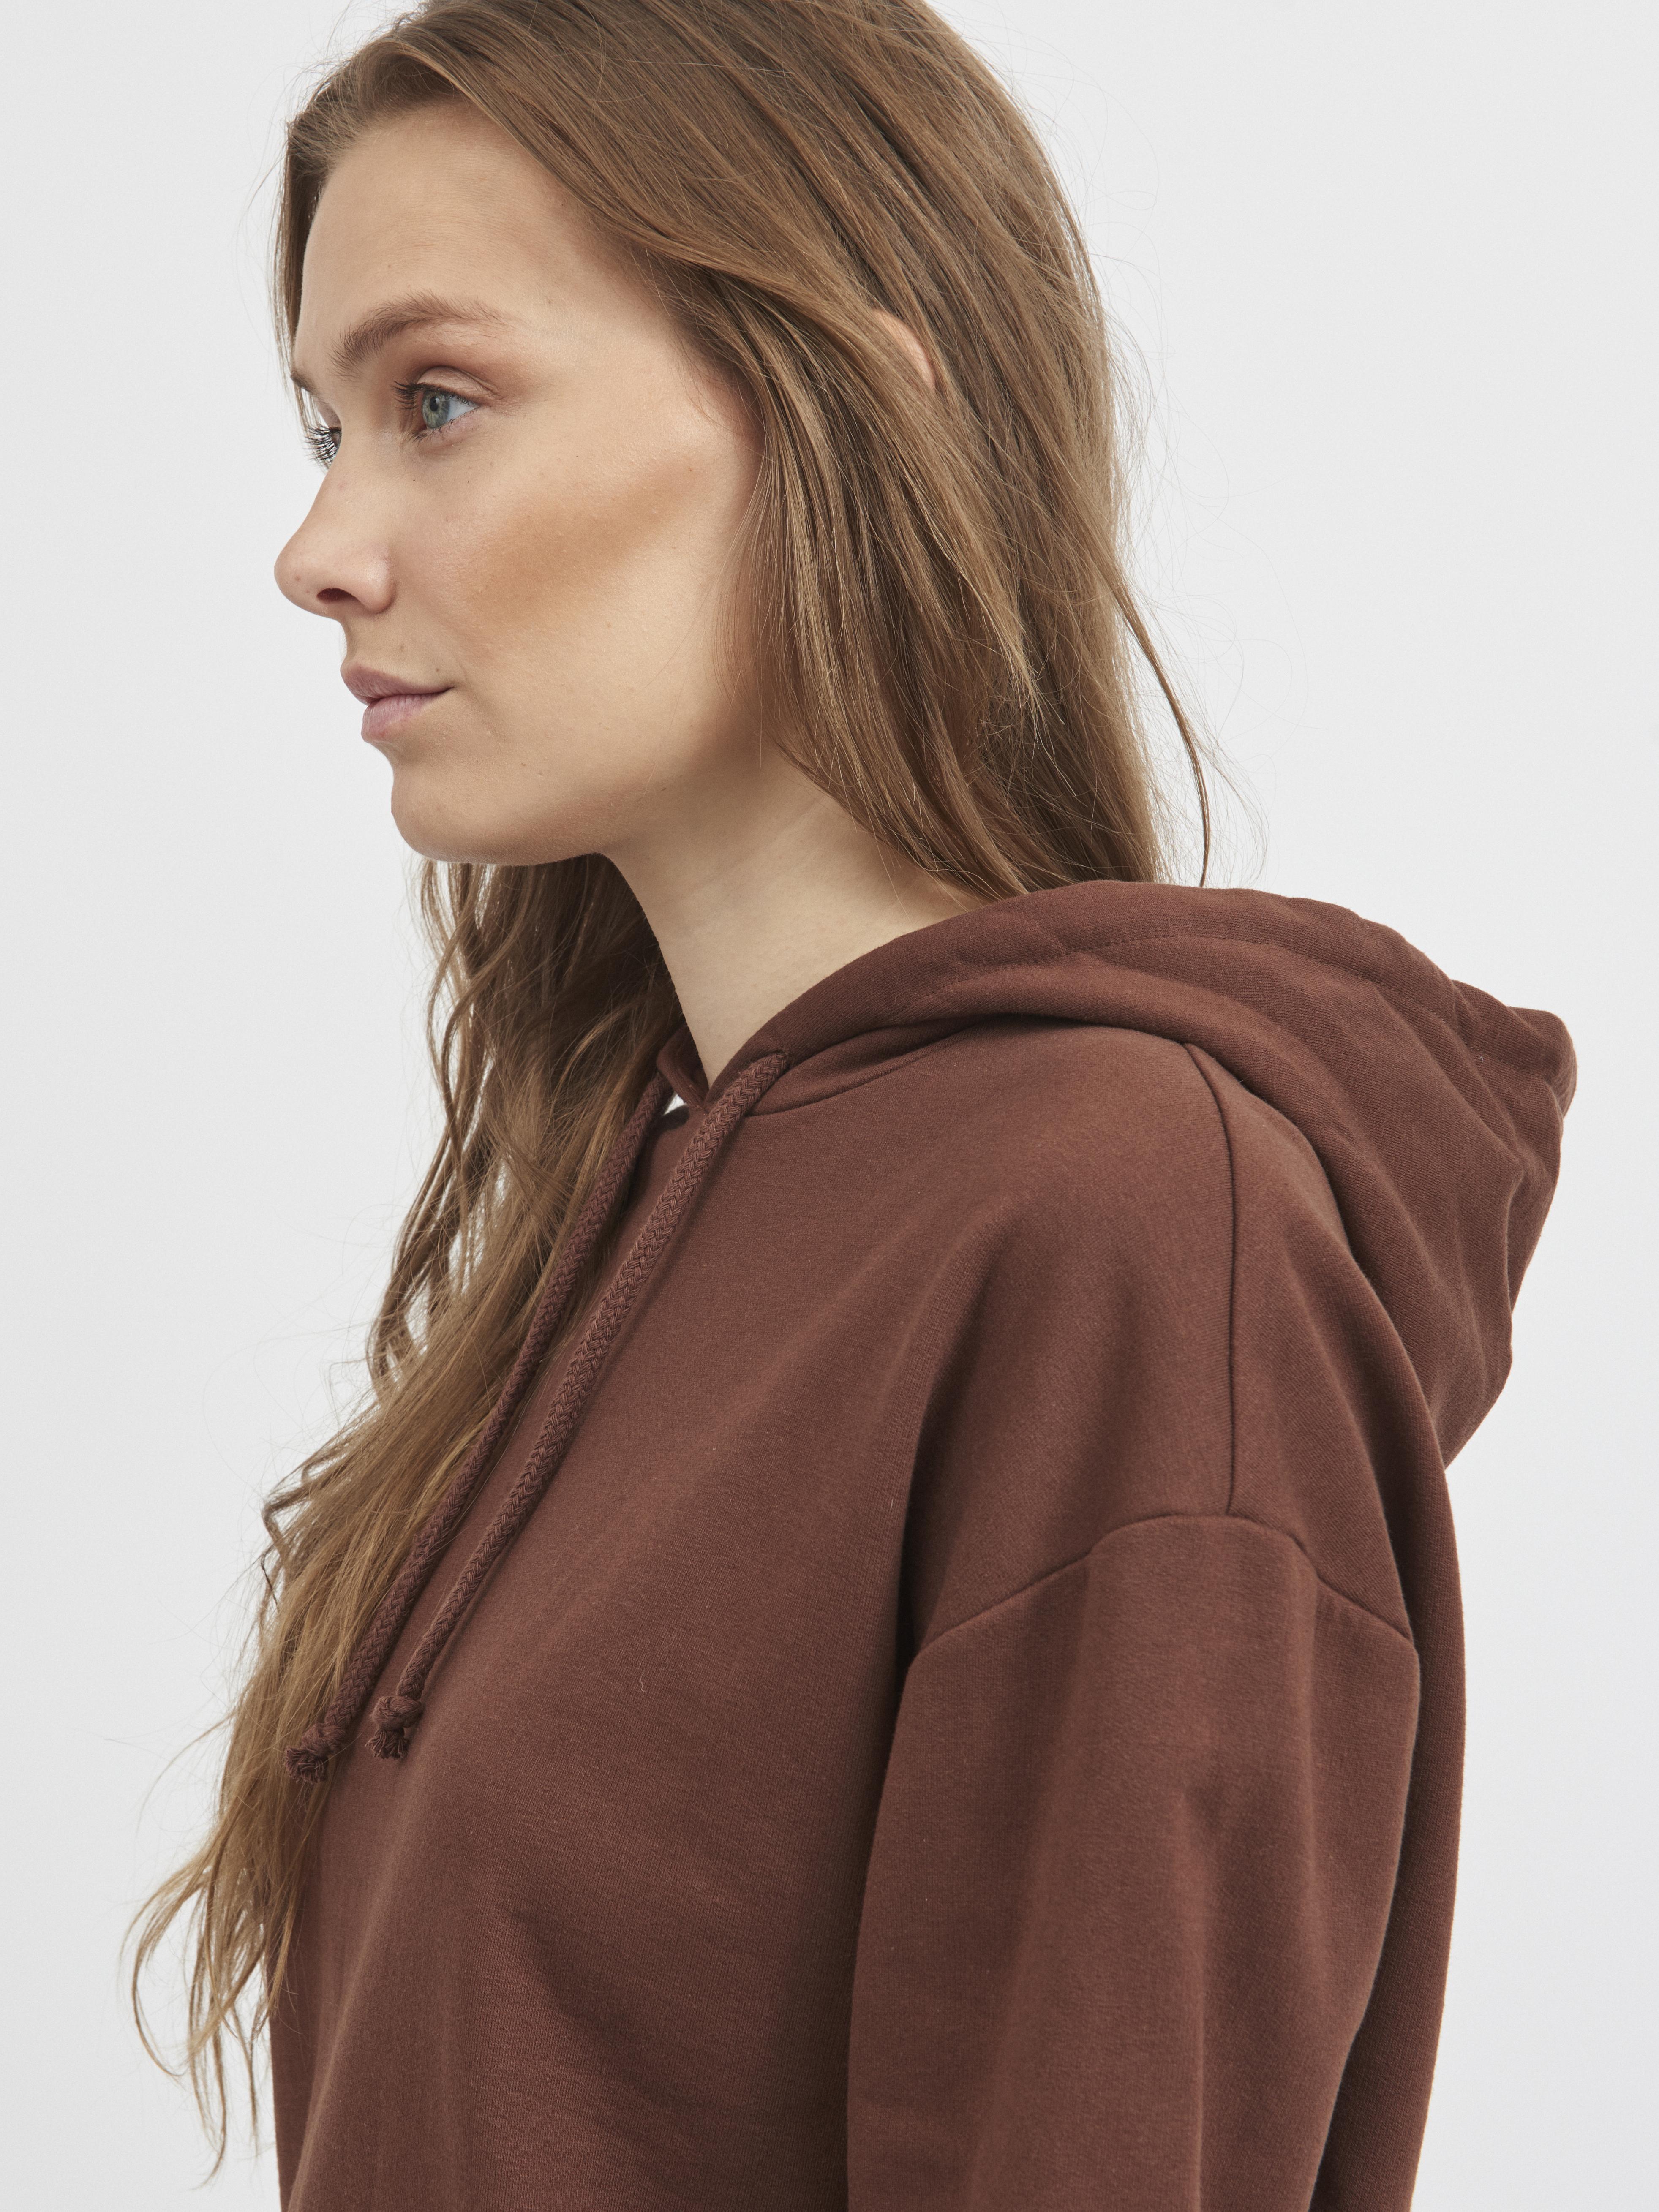 VILA Hoodie, Chocolate Lab, XL